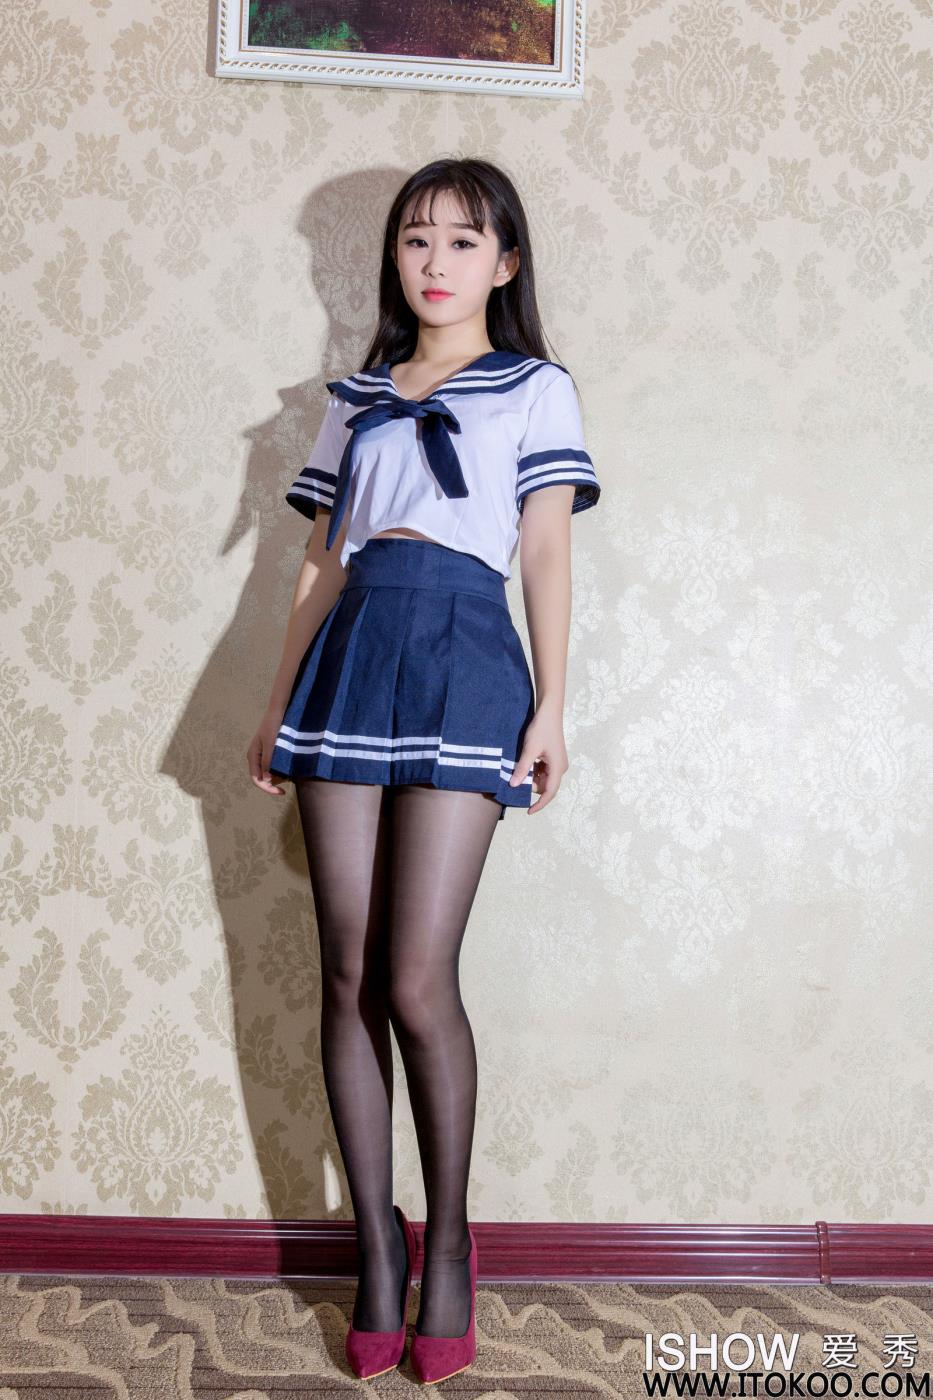 ISHOW爱秀兔囡囡JK制服诱惑黑丝美腿写真套图